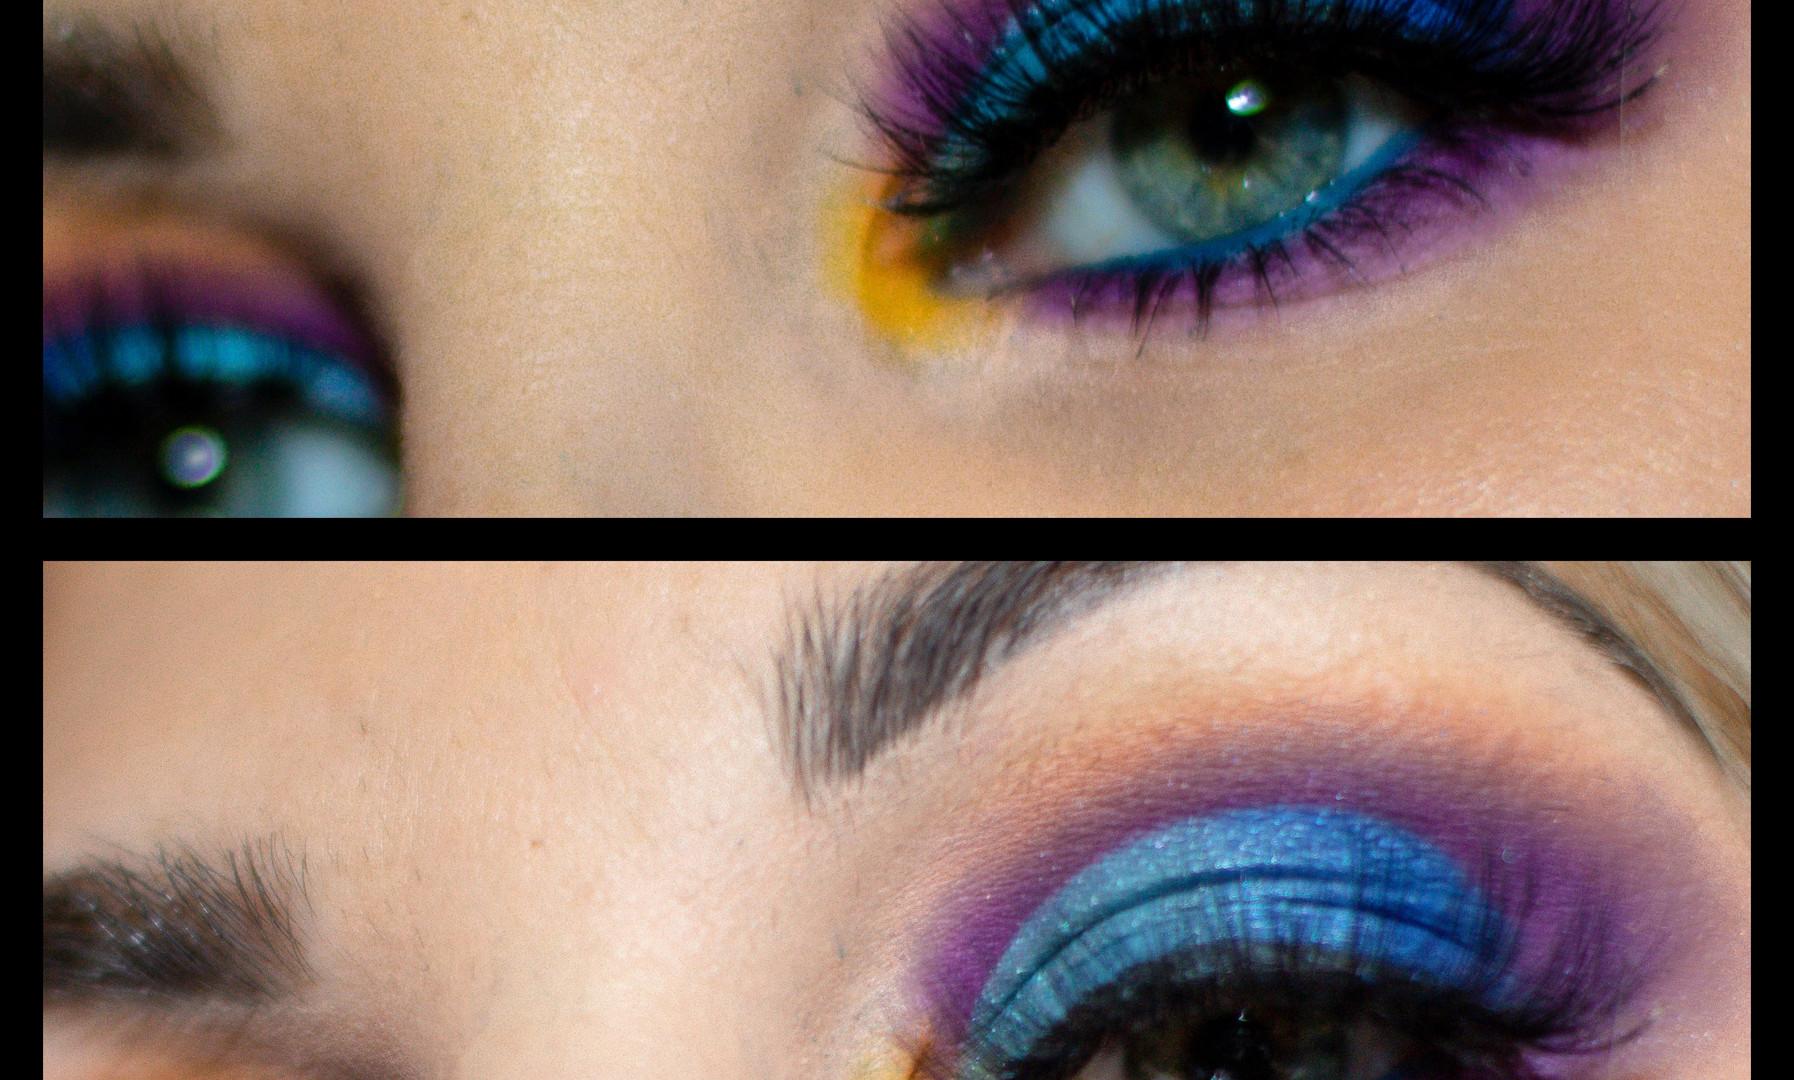 Mutlicolour eye makeup